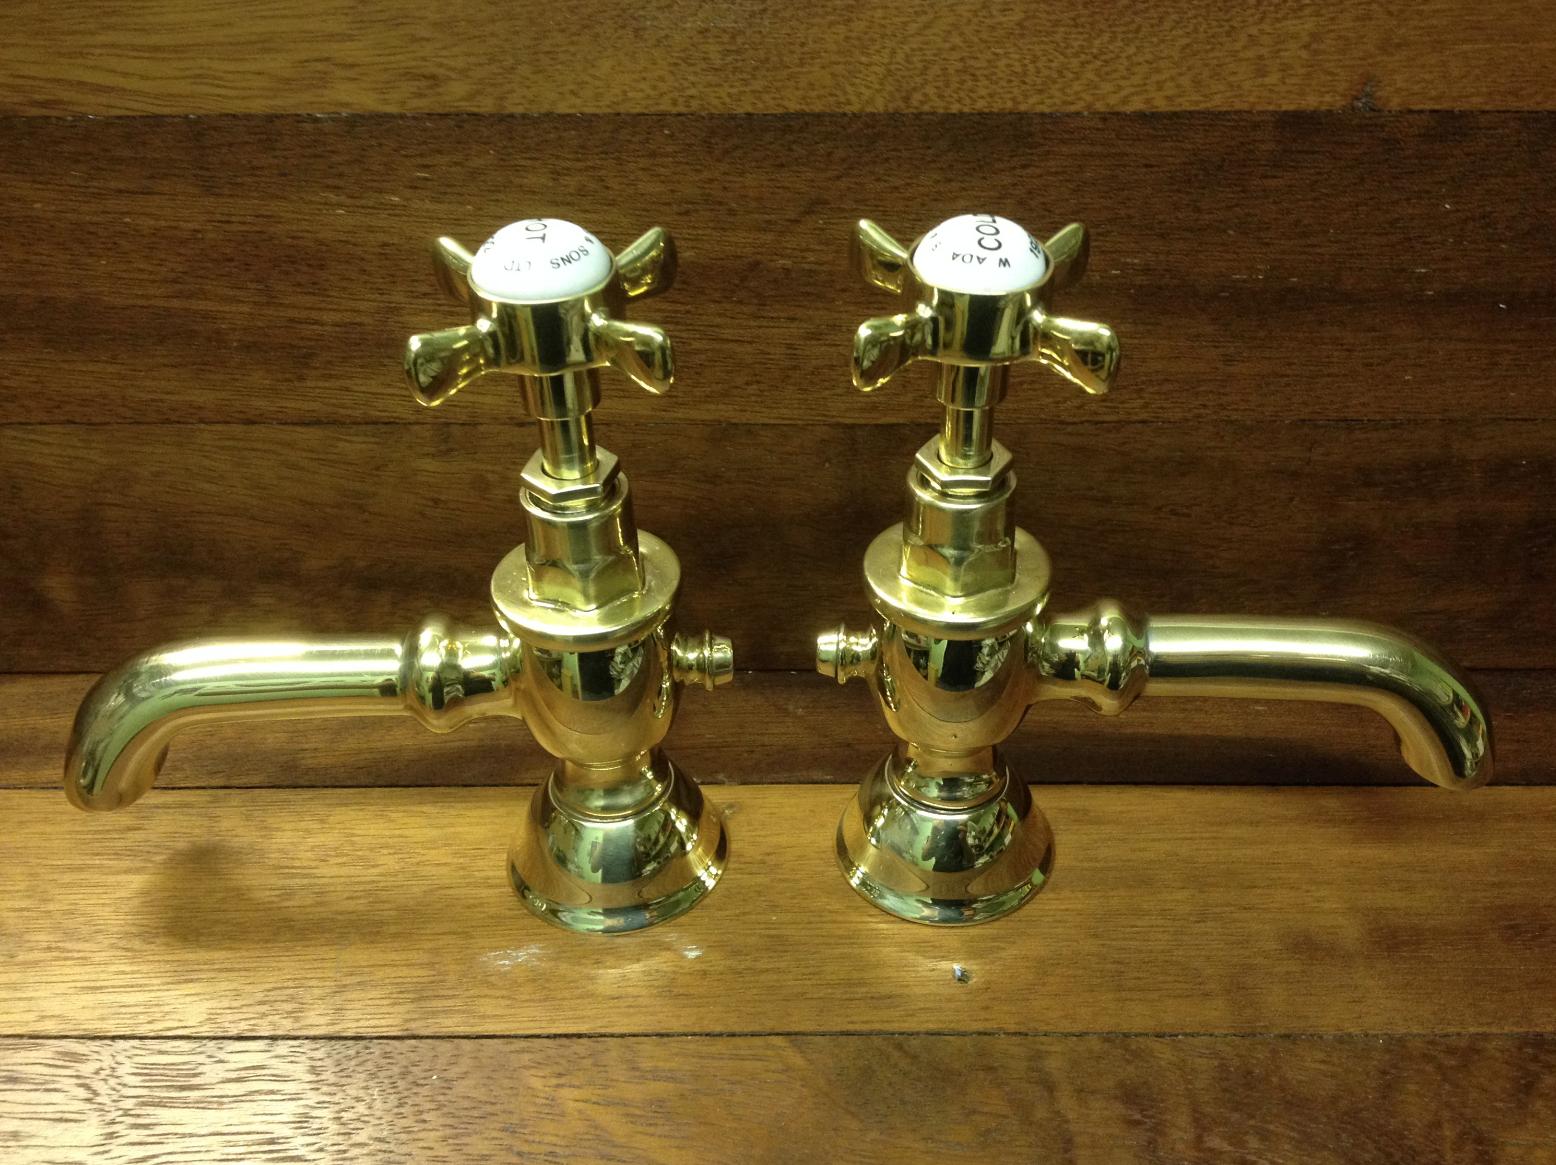 Adams 1922 basin taps in Polished Brass - FOR SALE - Tap Refurbishment f70b4feed